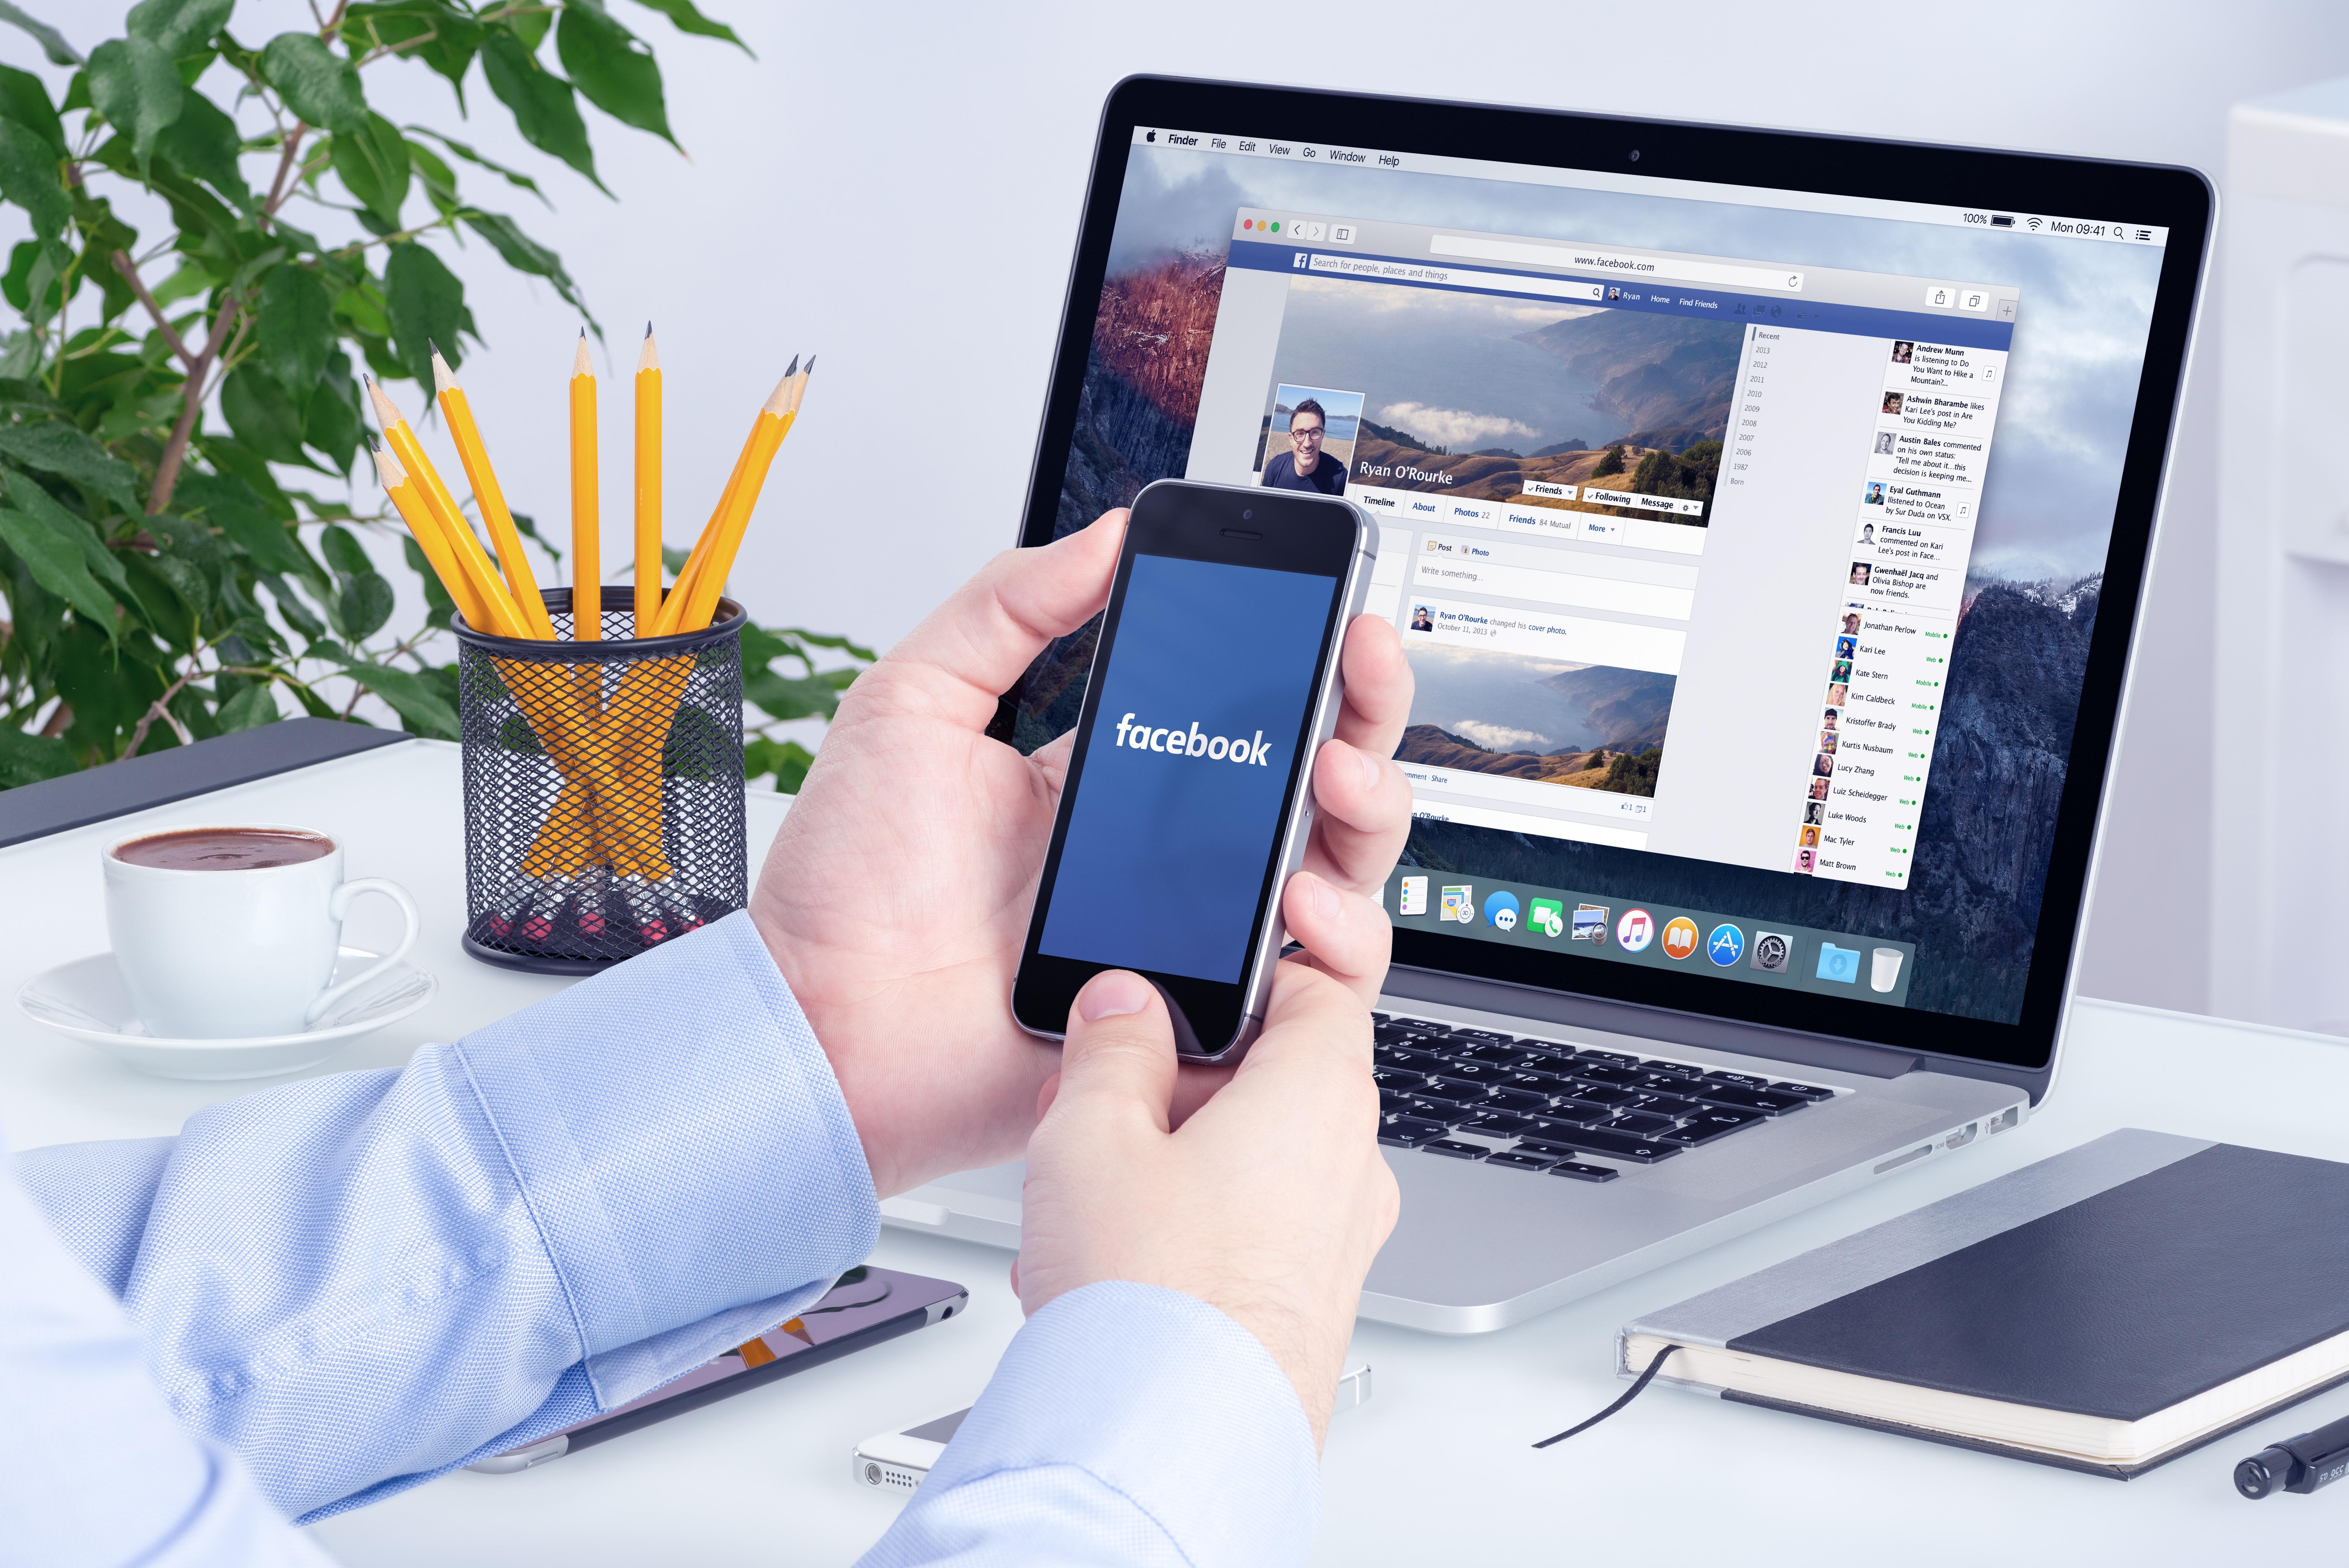 bigstock-Facebook-App-On-The-Apple-Ipho-95499020